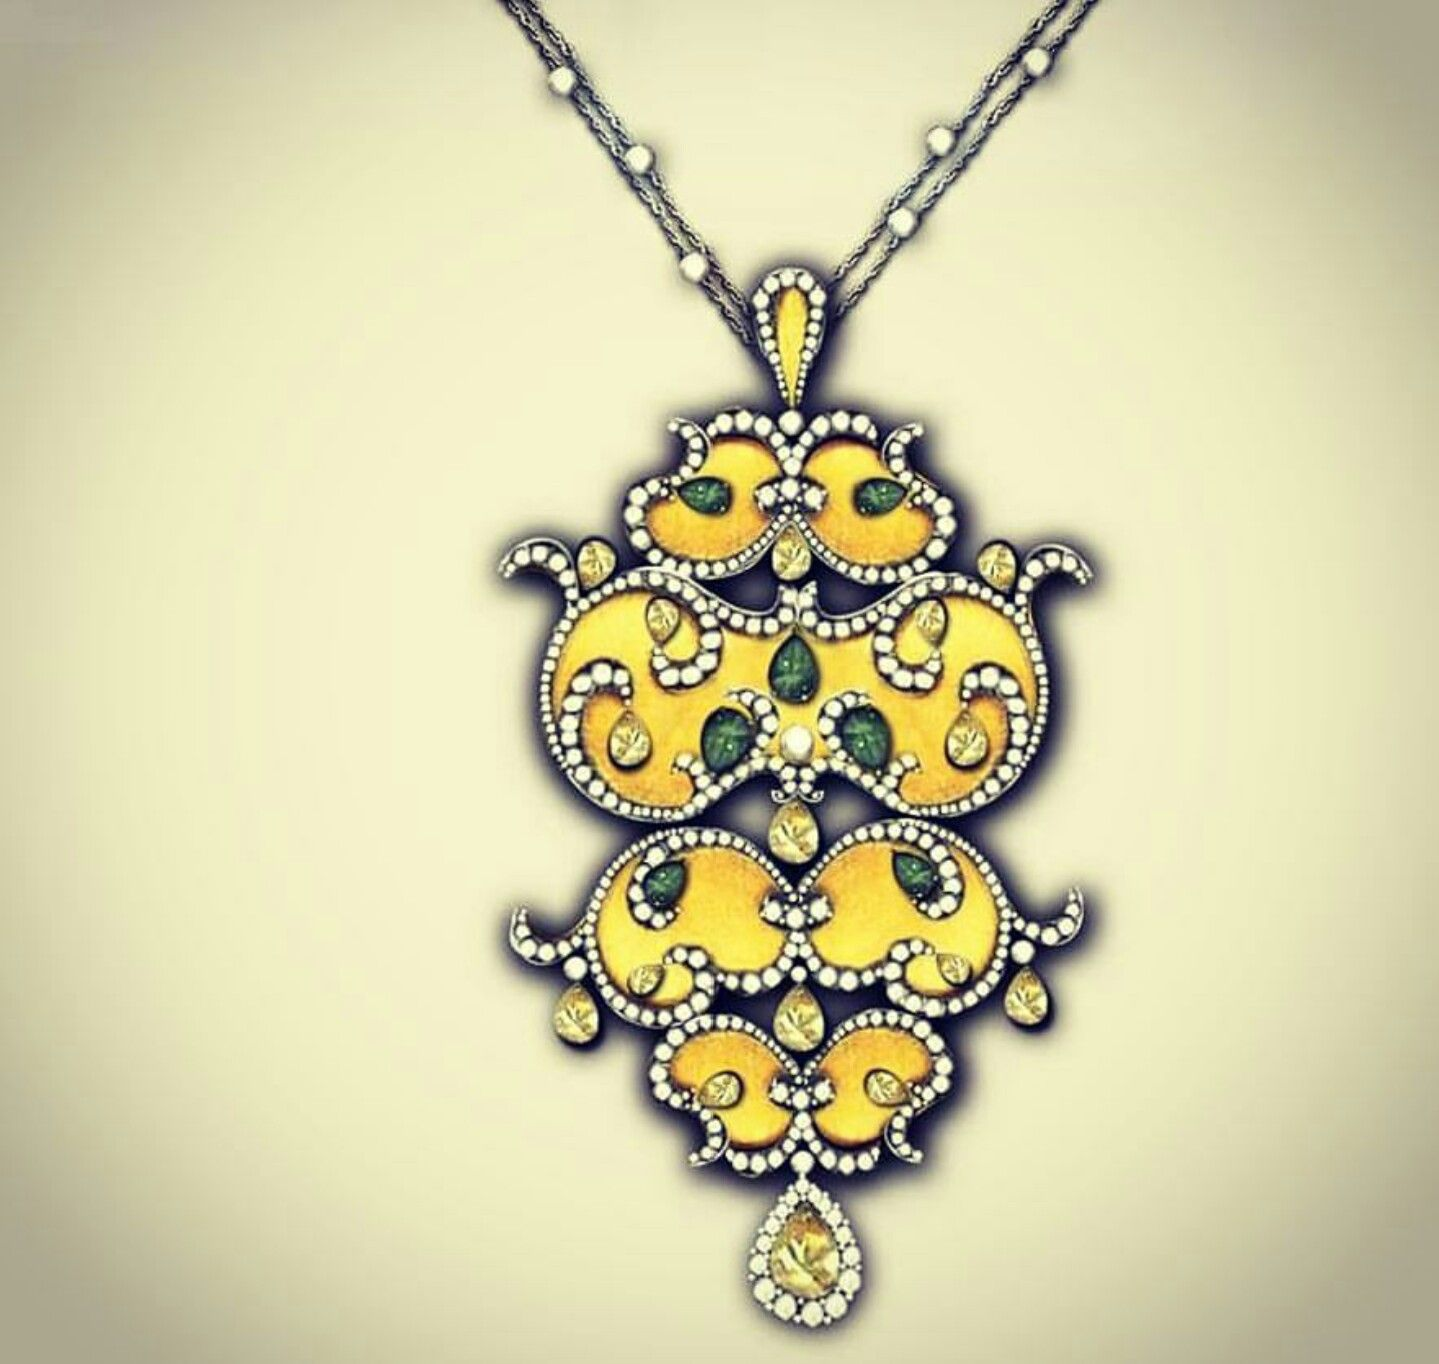 Pin by ravi joshi on Jewellery sketch | Pinterest | Jewellery ...